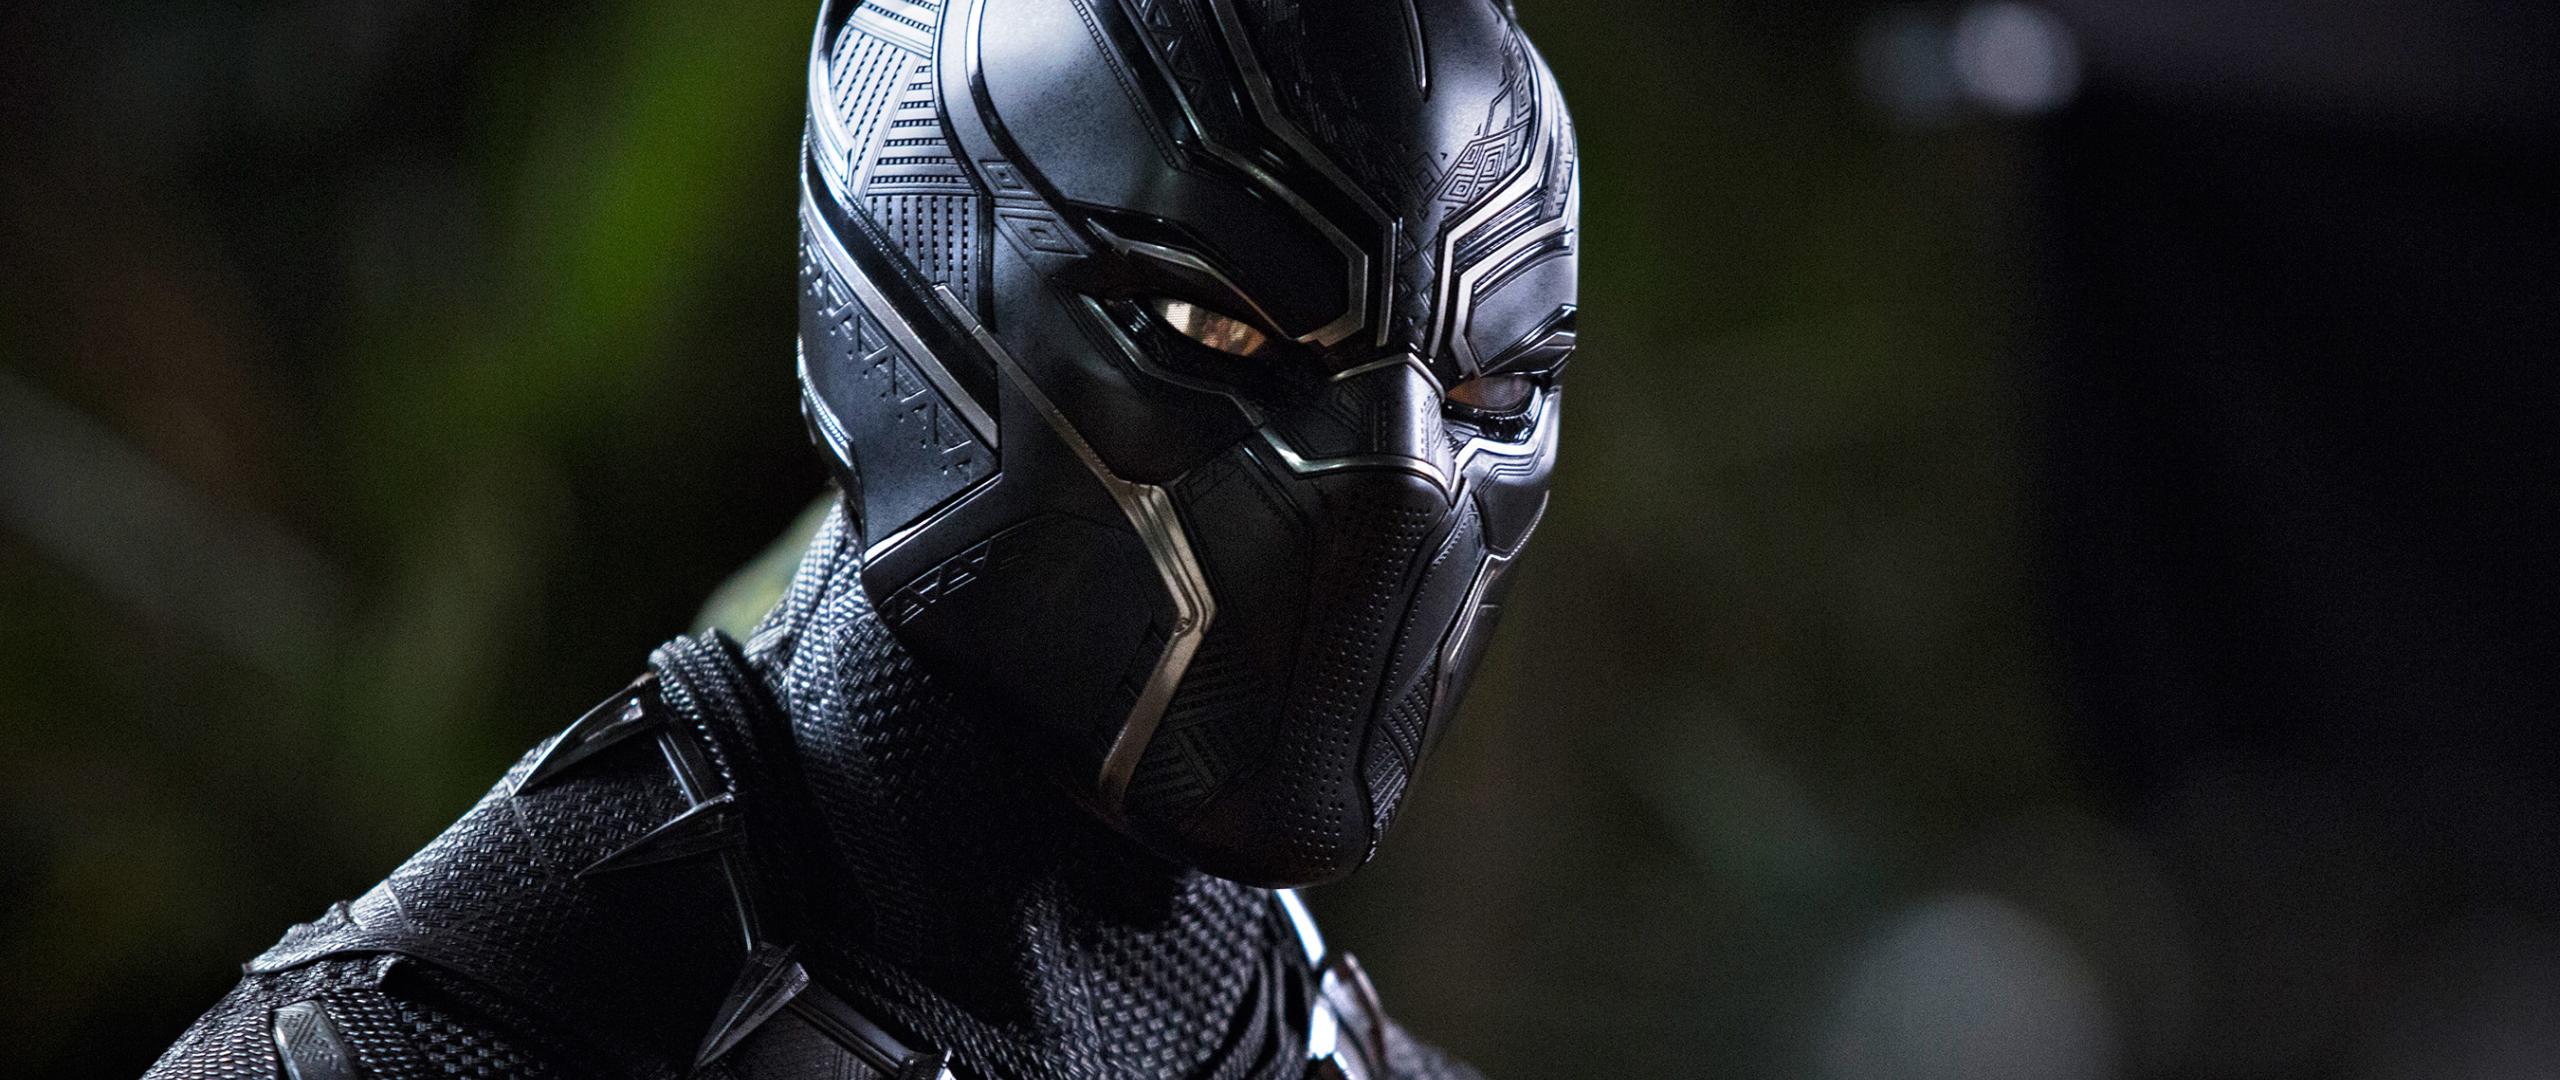 black panther movie, full hd 2k wallpaper